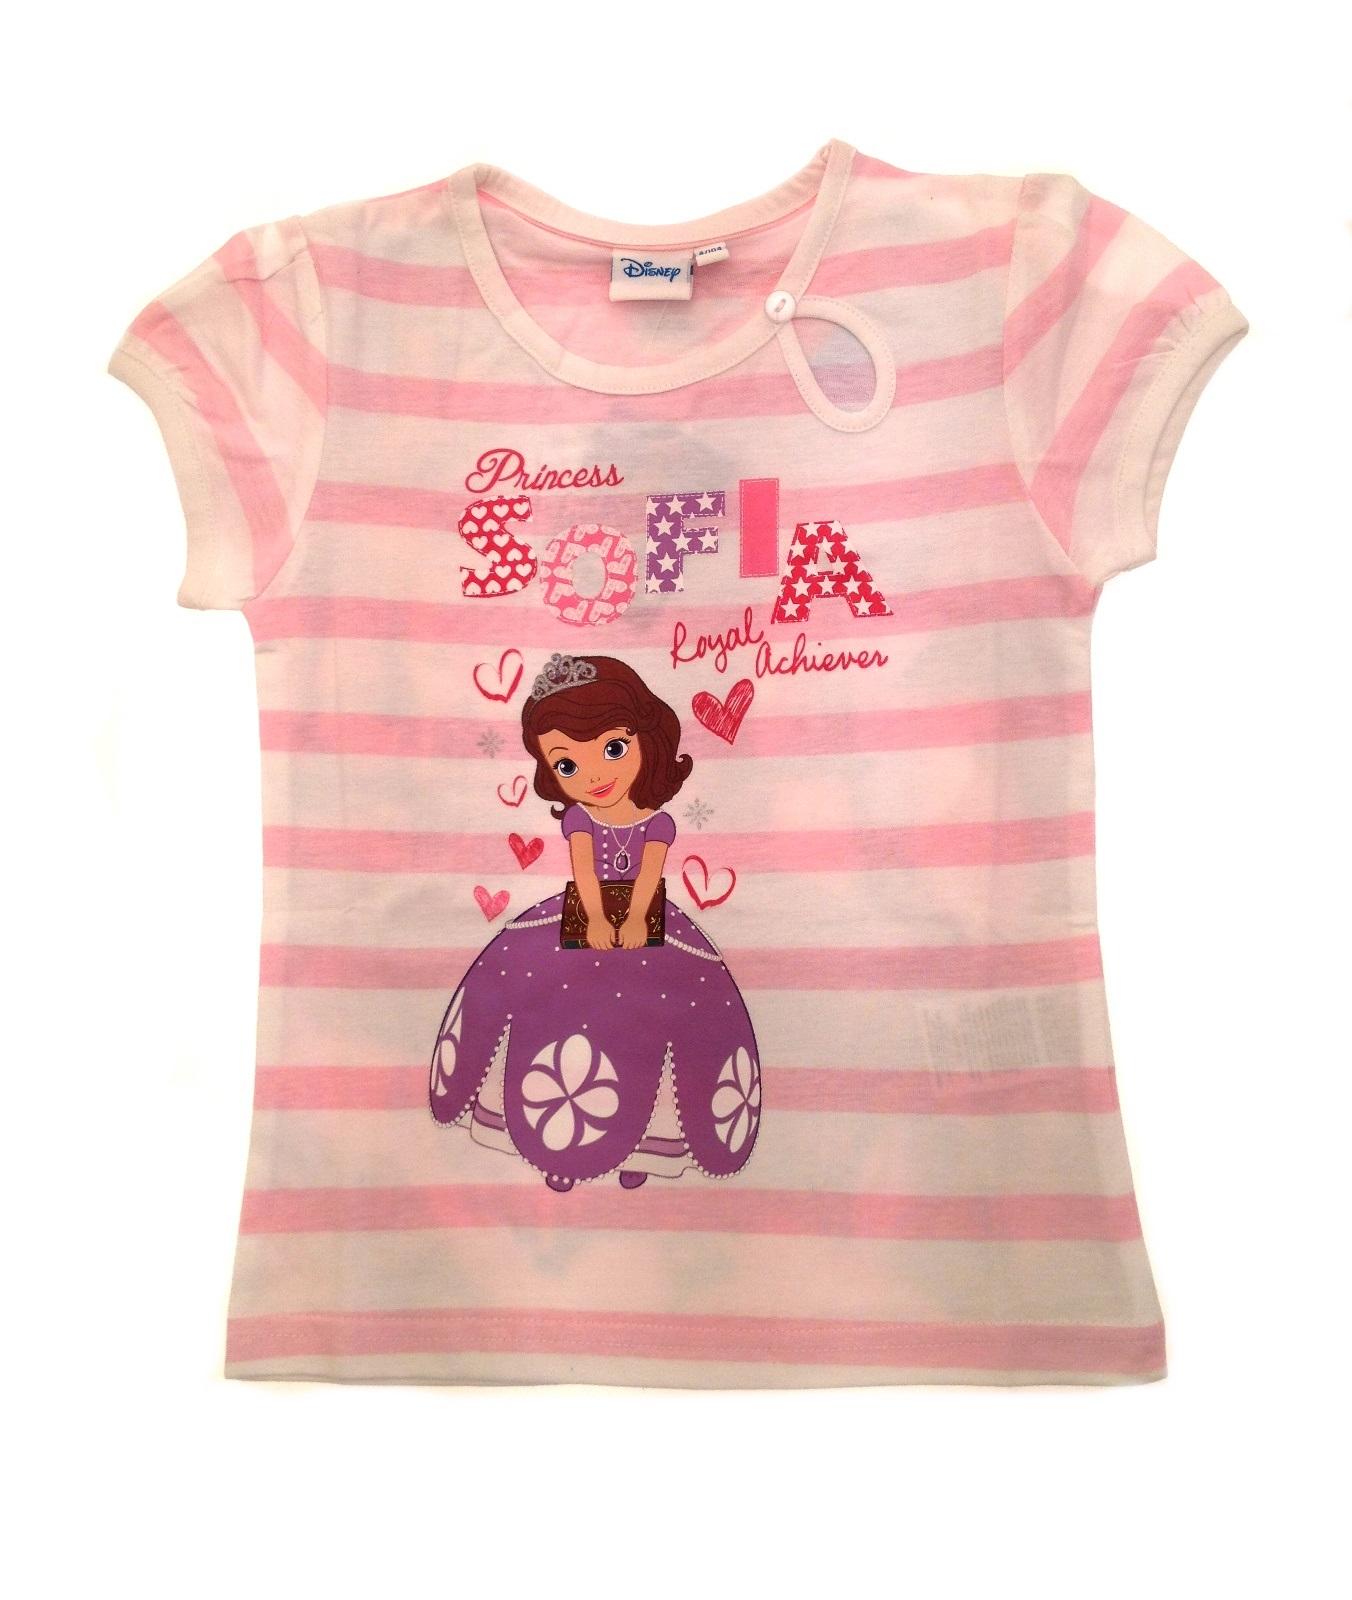 disney princess sofia t shirt short sleeved top girls clothing kids uk 2 8 years ebay. Black Bedroom Furniture Sets. Home Design Ideas